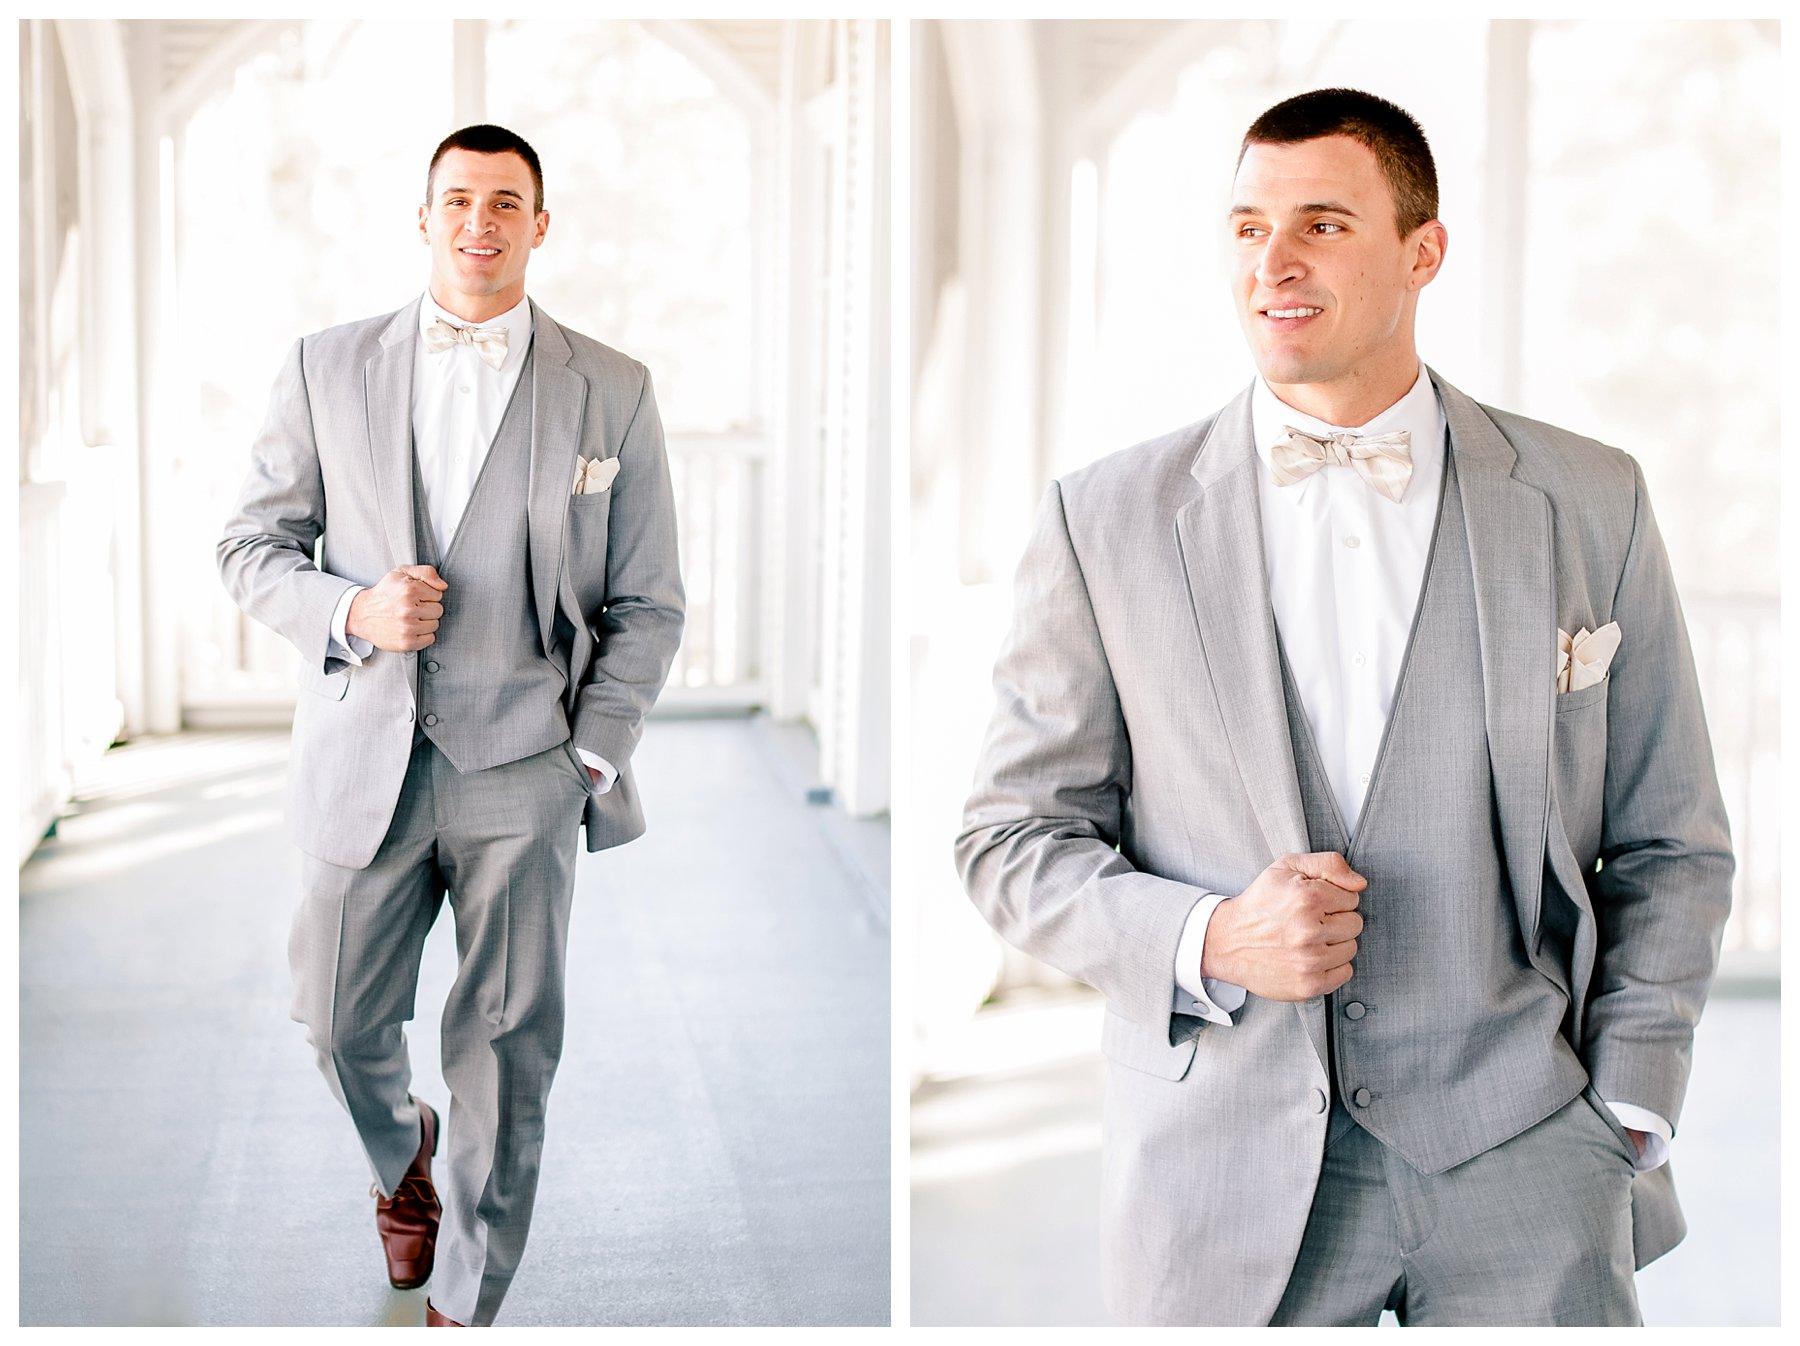 photographer_wedding_saint_louis_Kansas_City_Photography_Videography_workshop_training_styled_engagement_Lake_Ozark_KC_MO_STL_Rolla_Hermann_Saint_James_0367.jpg